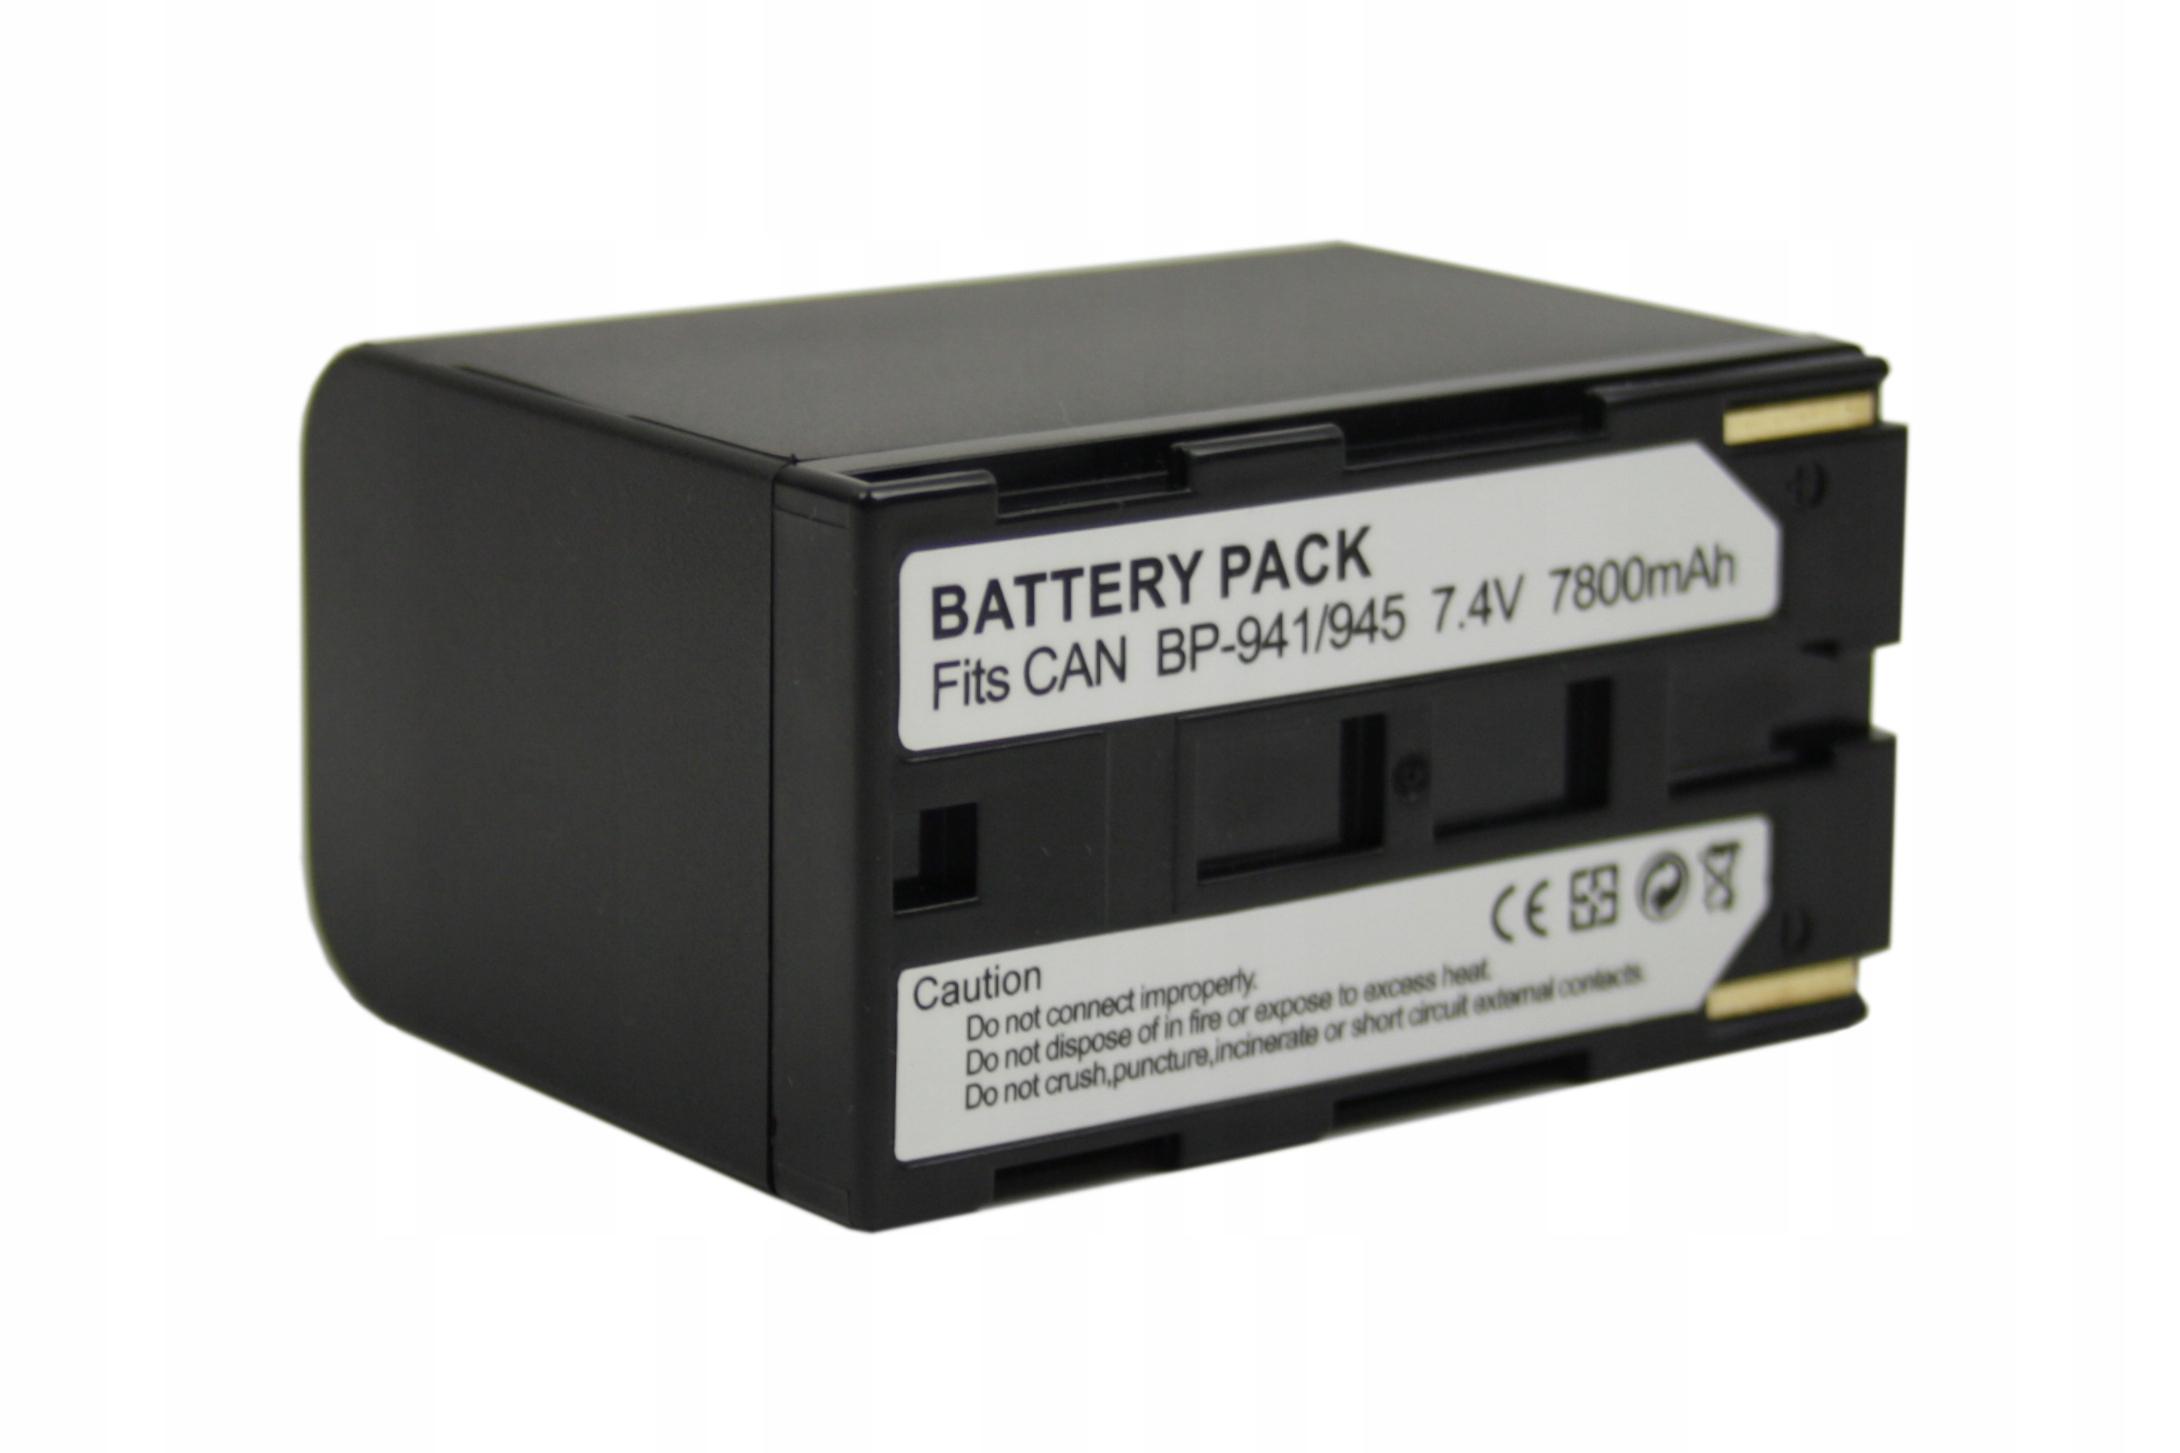 BATERIA AKUMULATOR CANON BP-911 BP-914 BP-915 MV1 - Baterie do aparatów cyfrowych